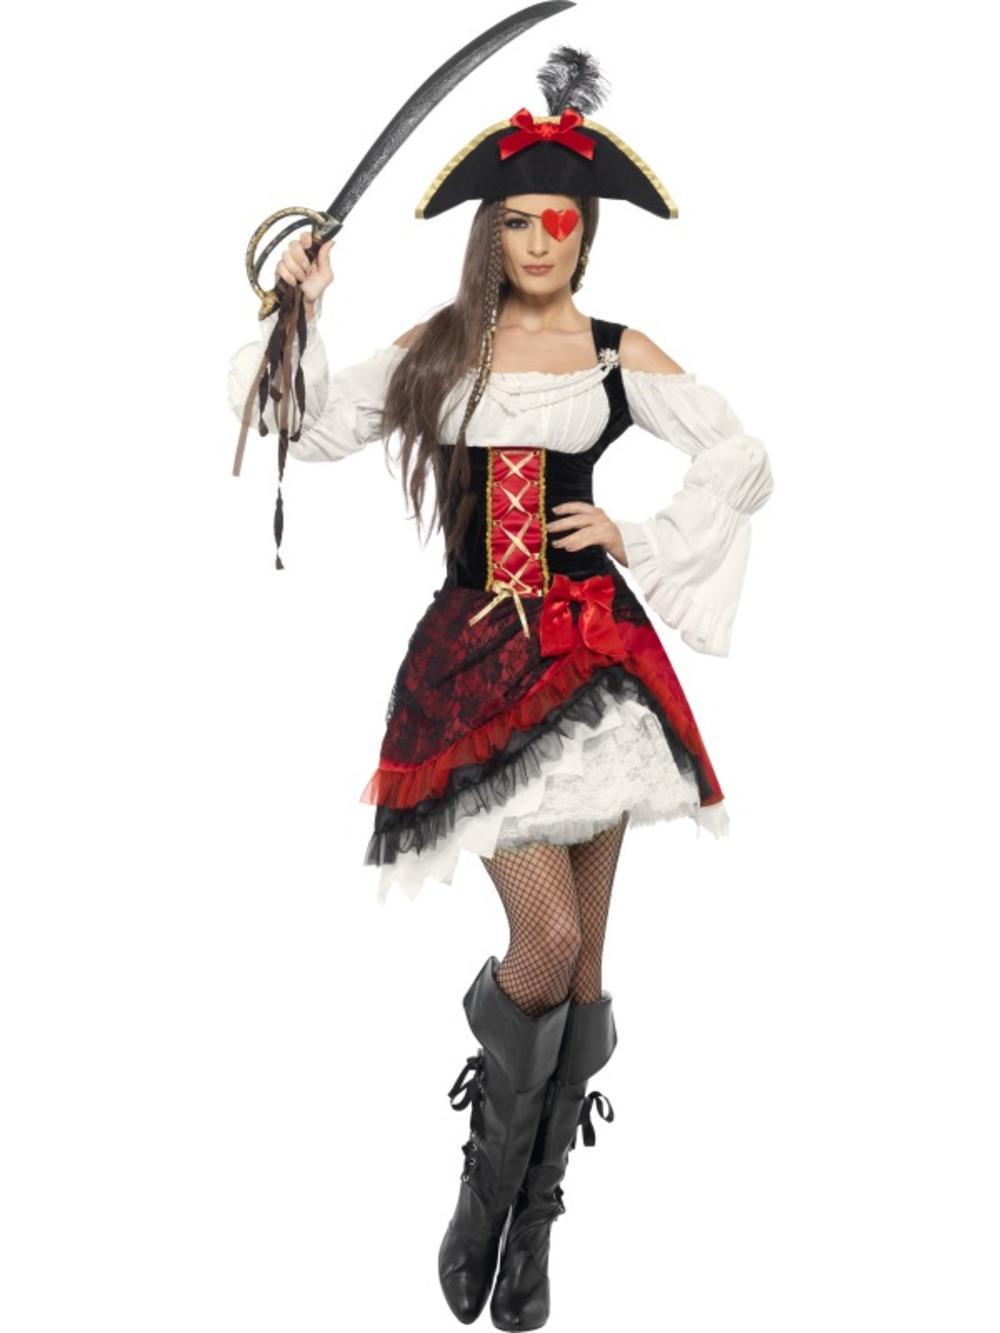 Deluxe Glamorous Pirate Ladies Fancy Dress Caribbean Buccaneer Adults Costume